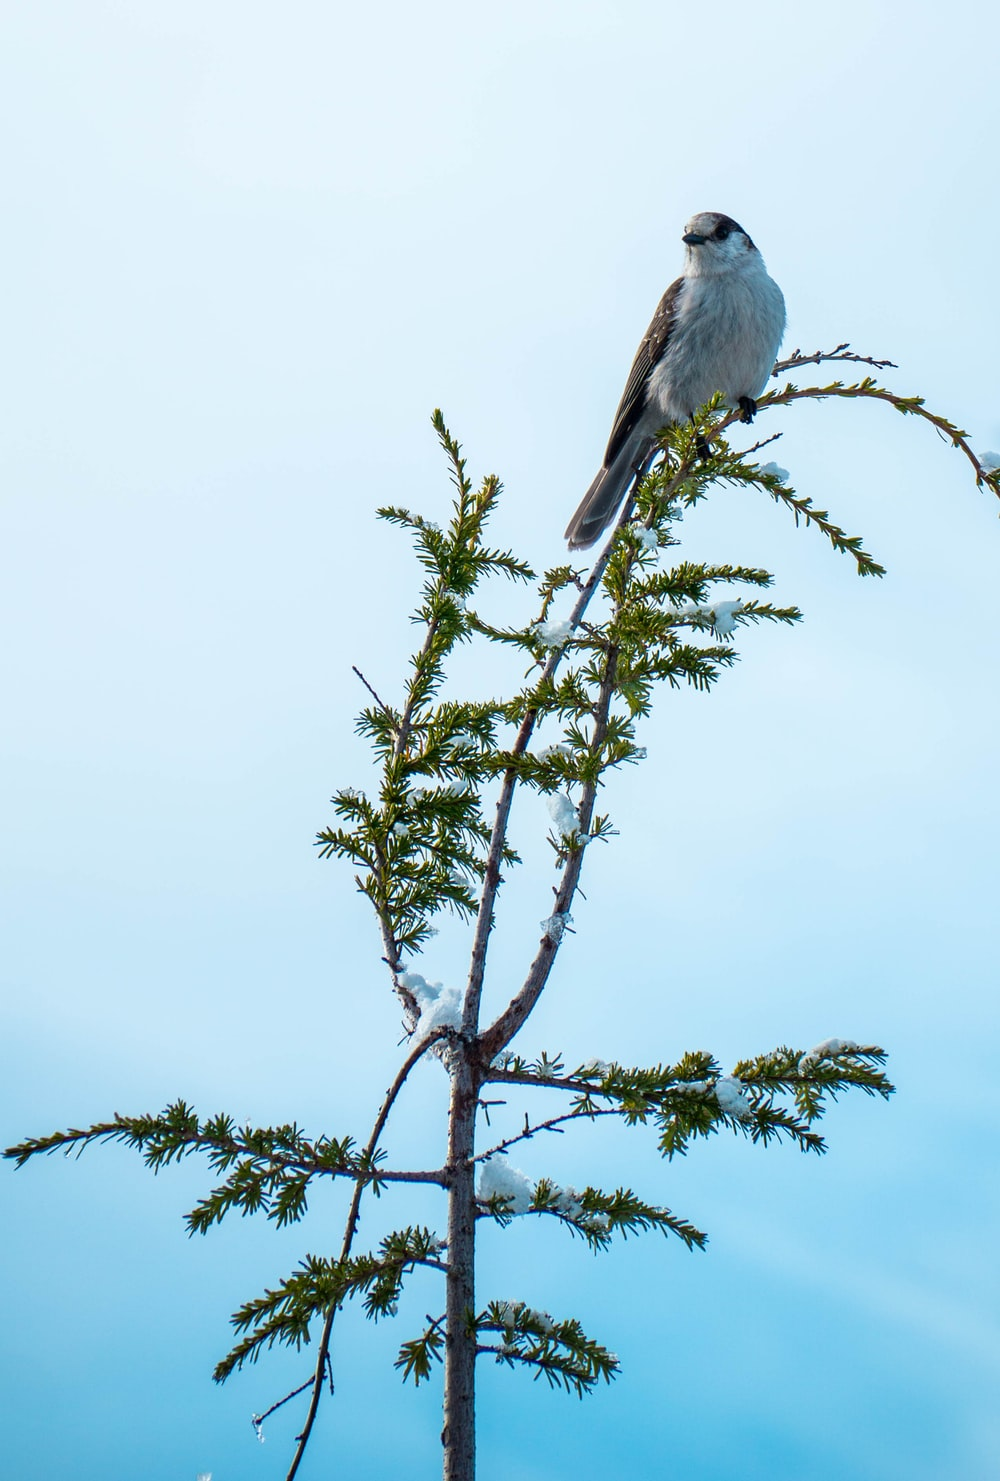 selective focus photography of gray bird on tree